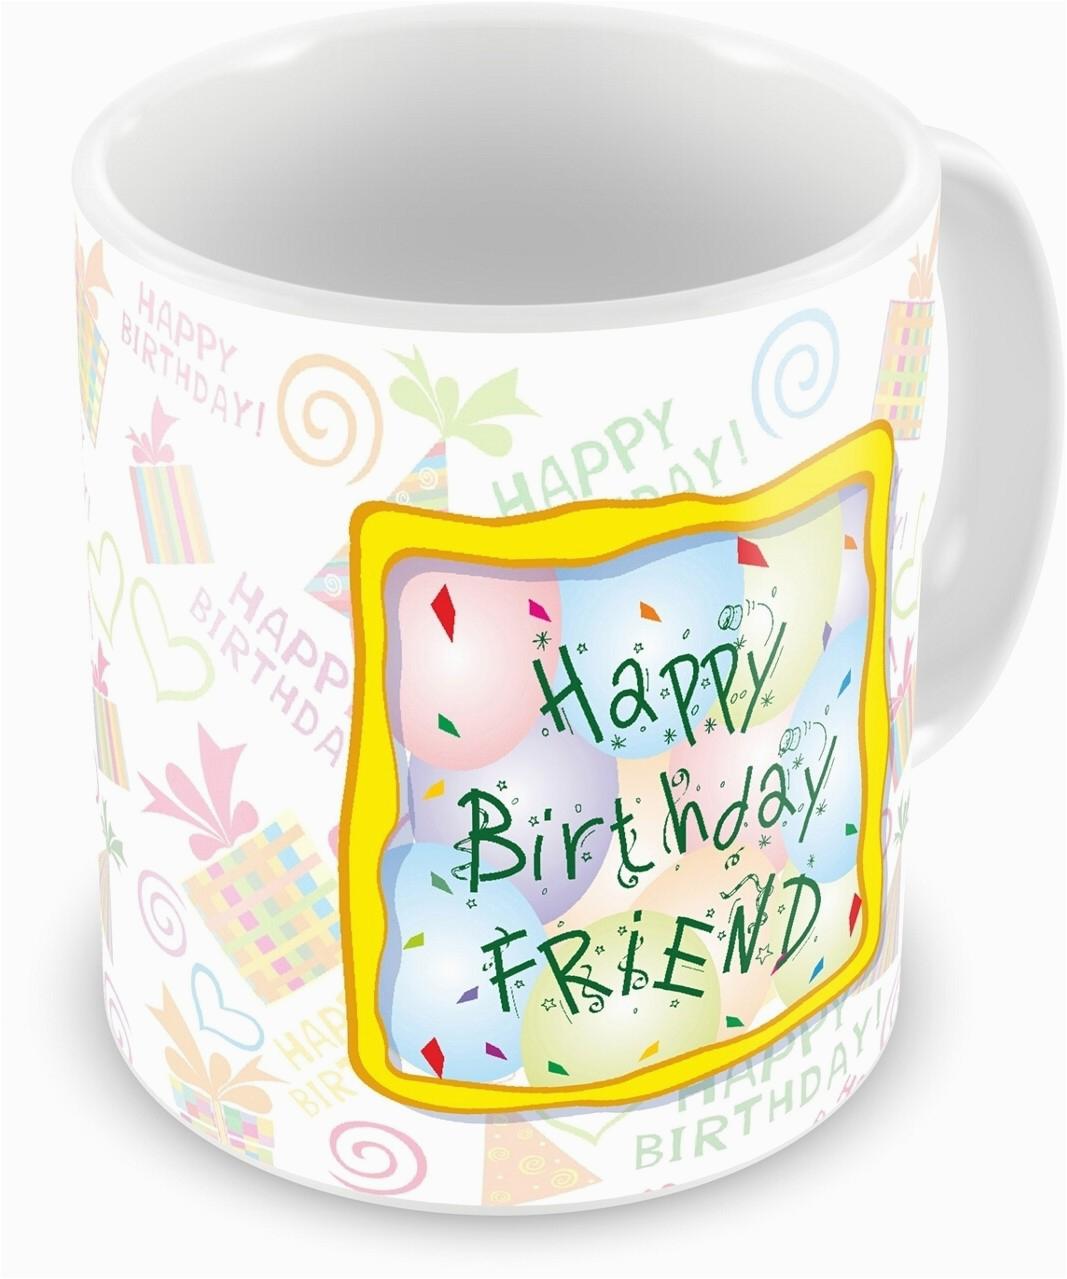 Everyday Gifts Happy Birthday Gift For Friend Ceramic Mug